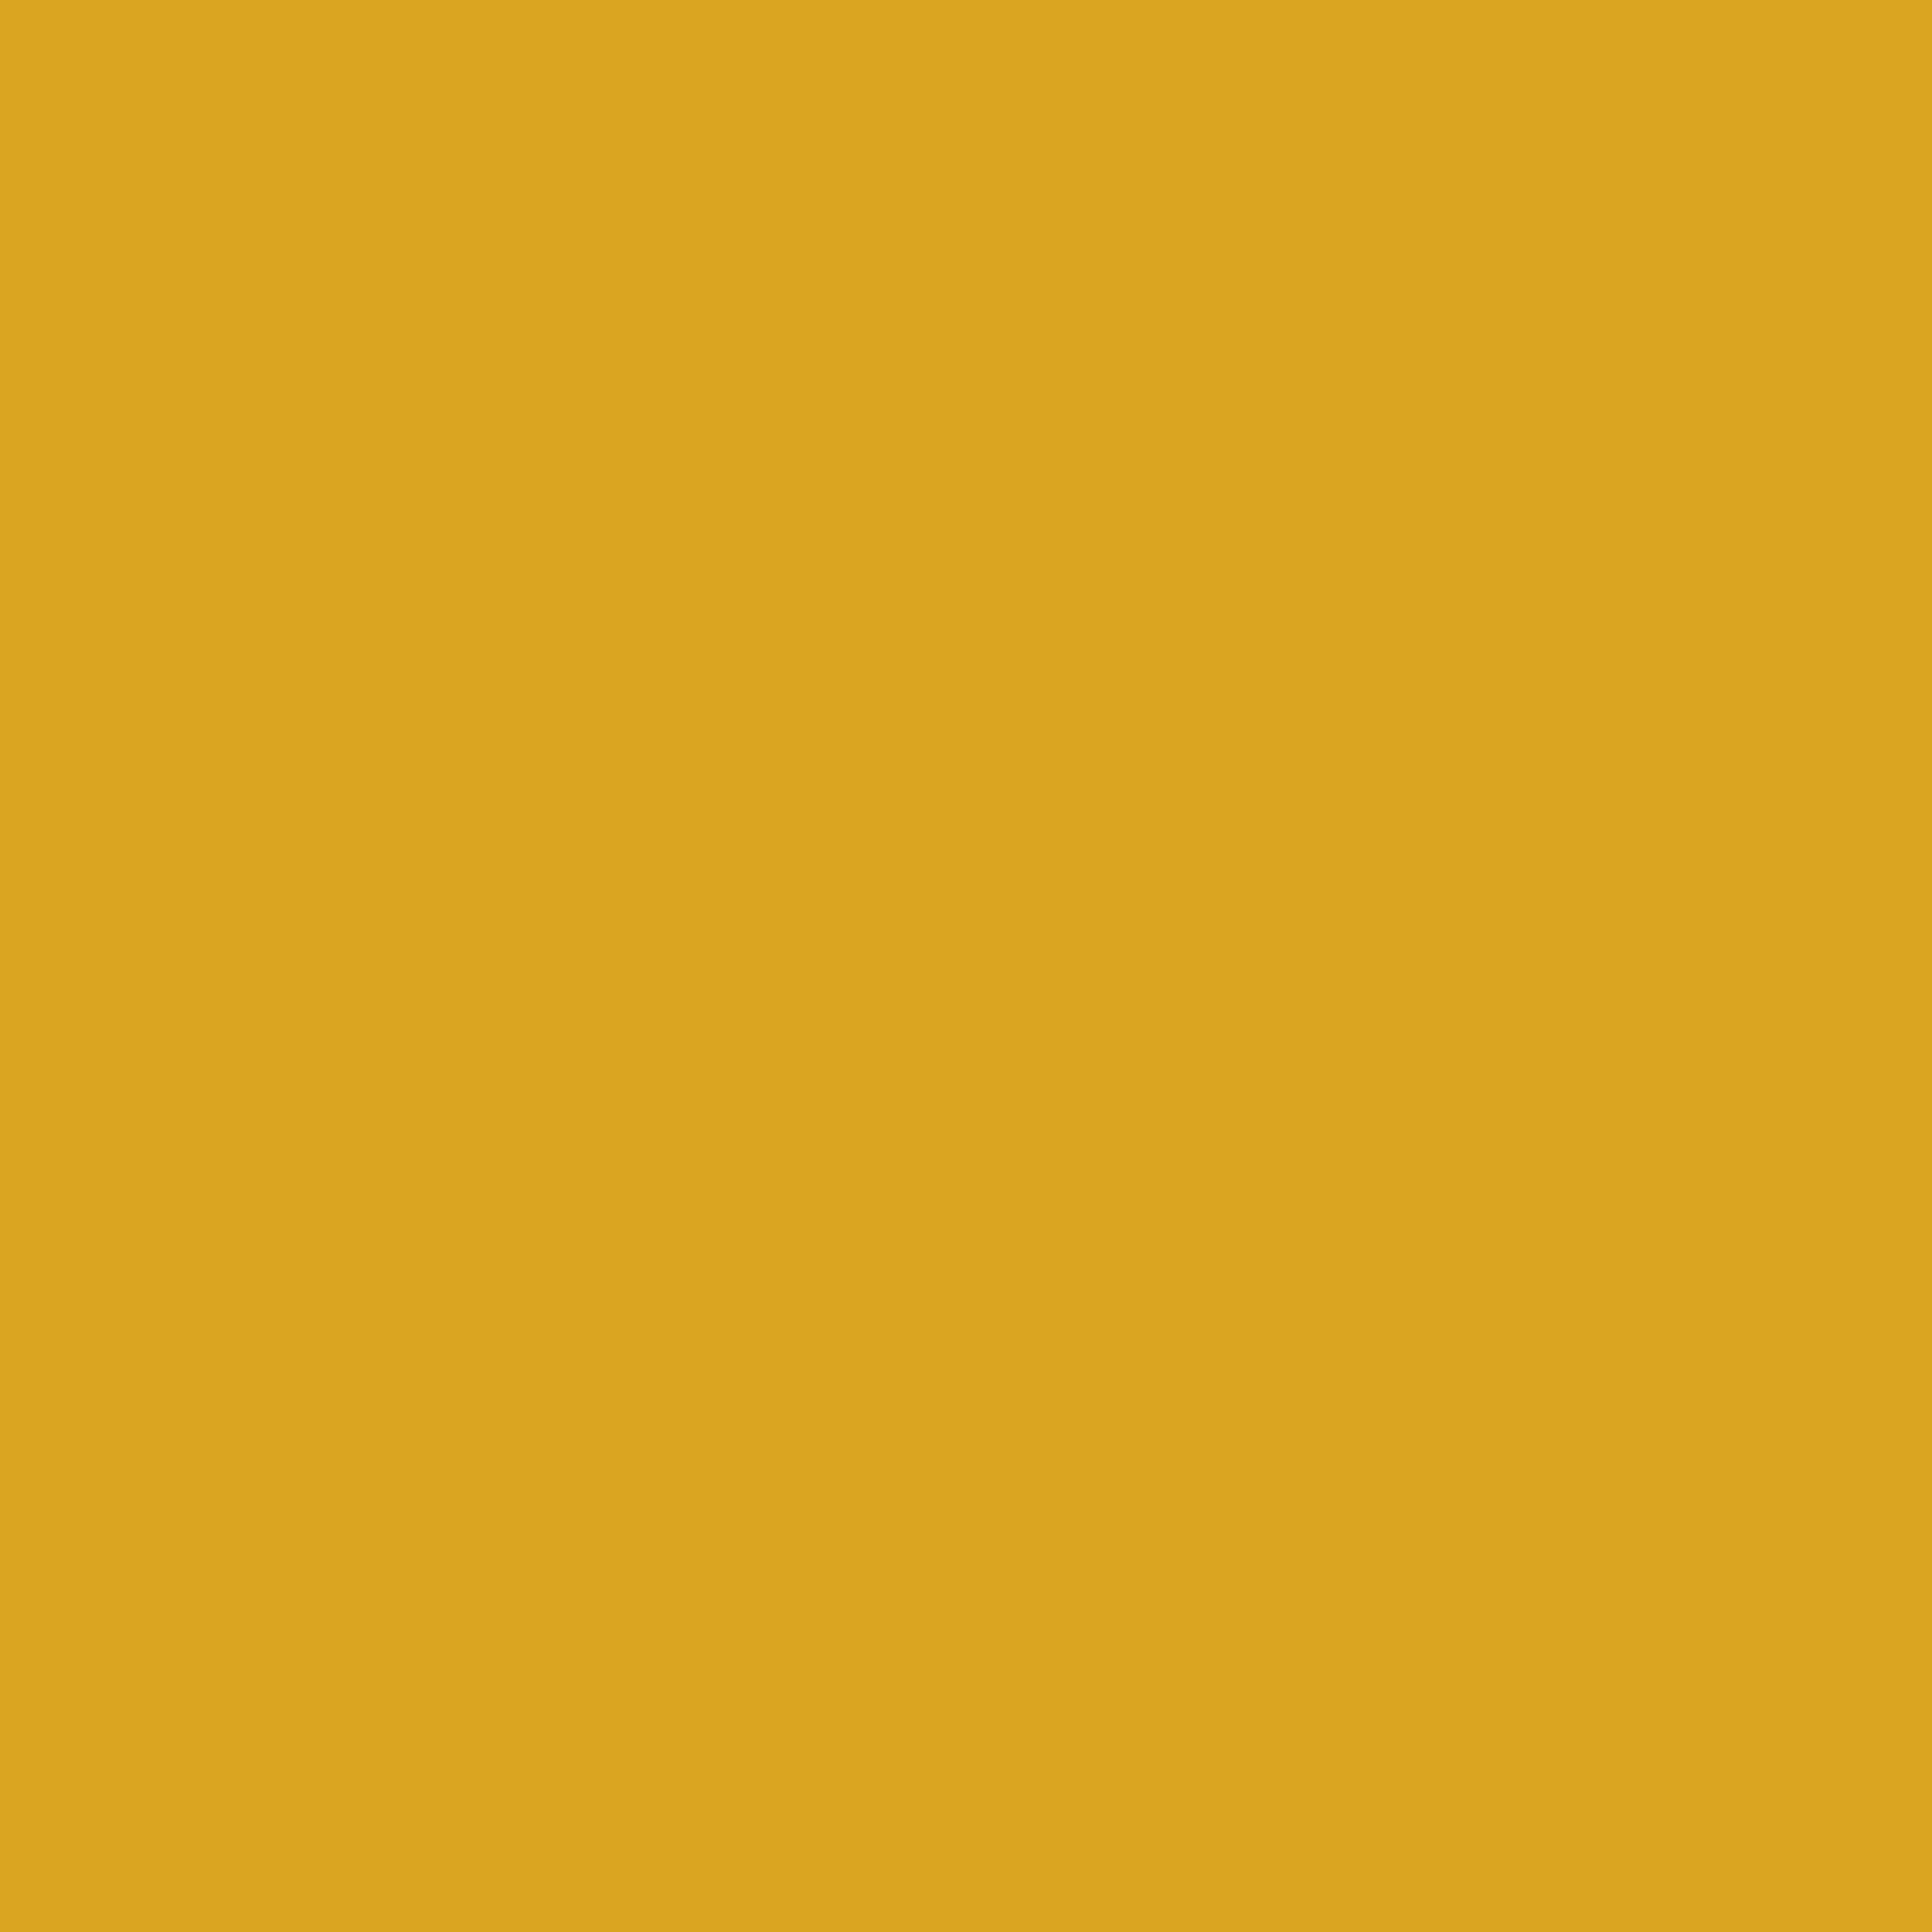 2732x2732 Goldenrod Solid Color Background